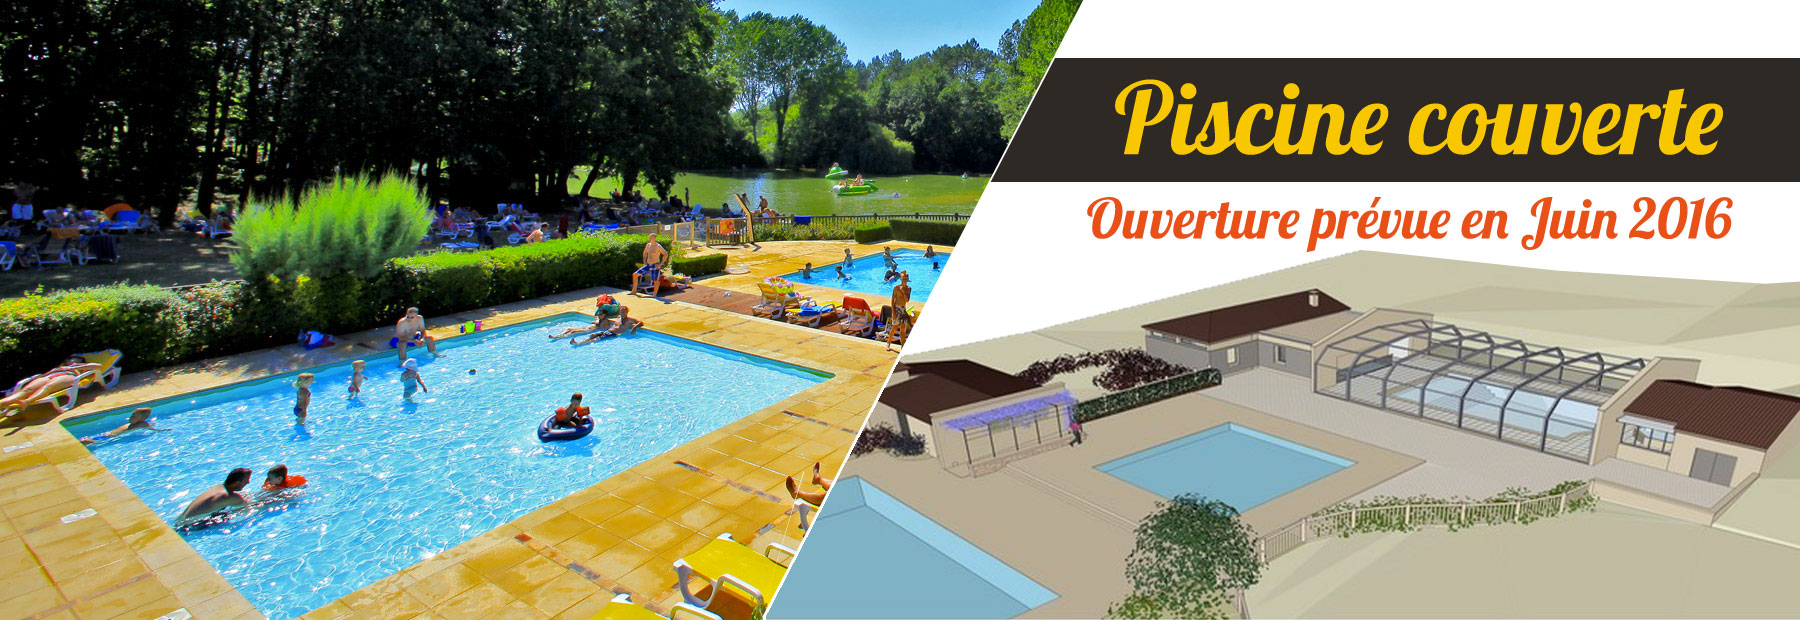 Camping dordogne avec piscine couverte et chauff e for Camping dordogne piscine couverte